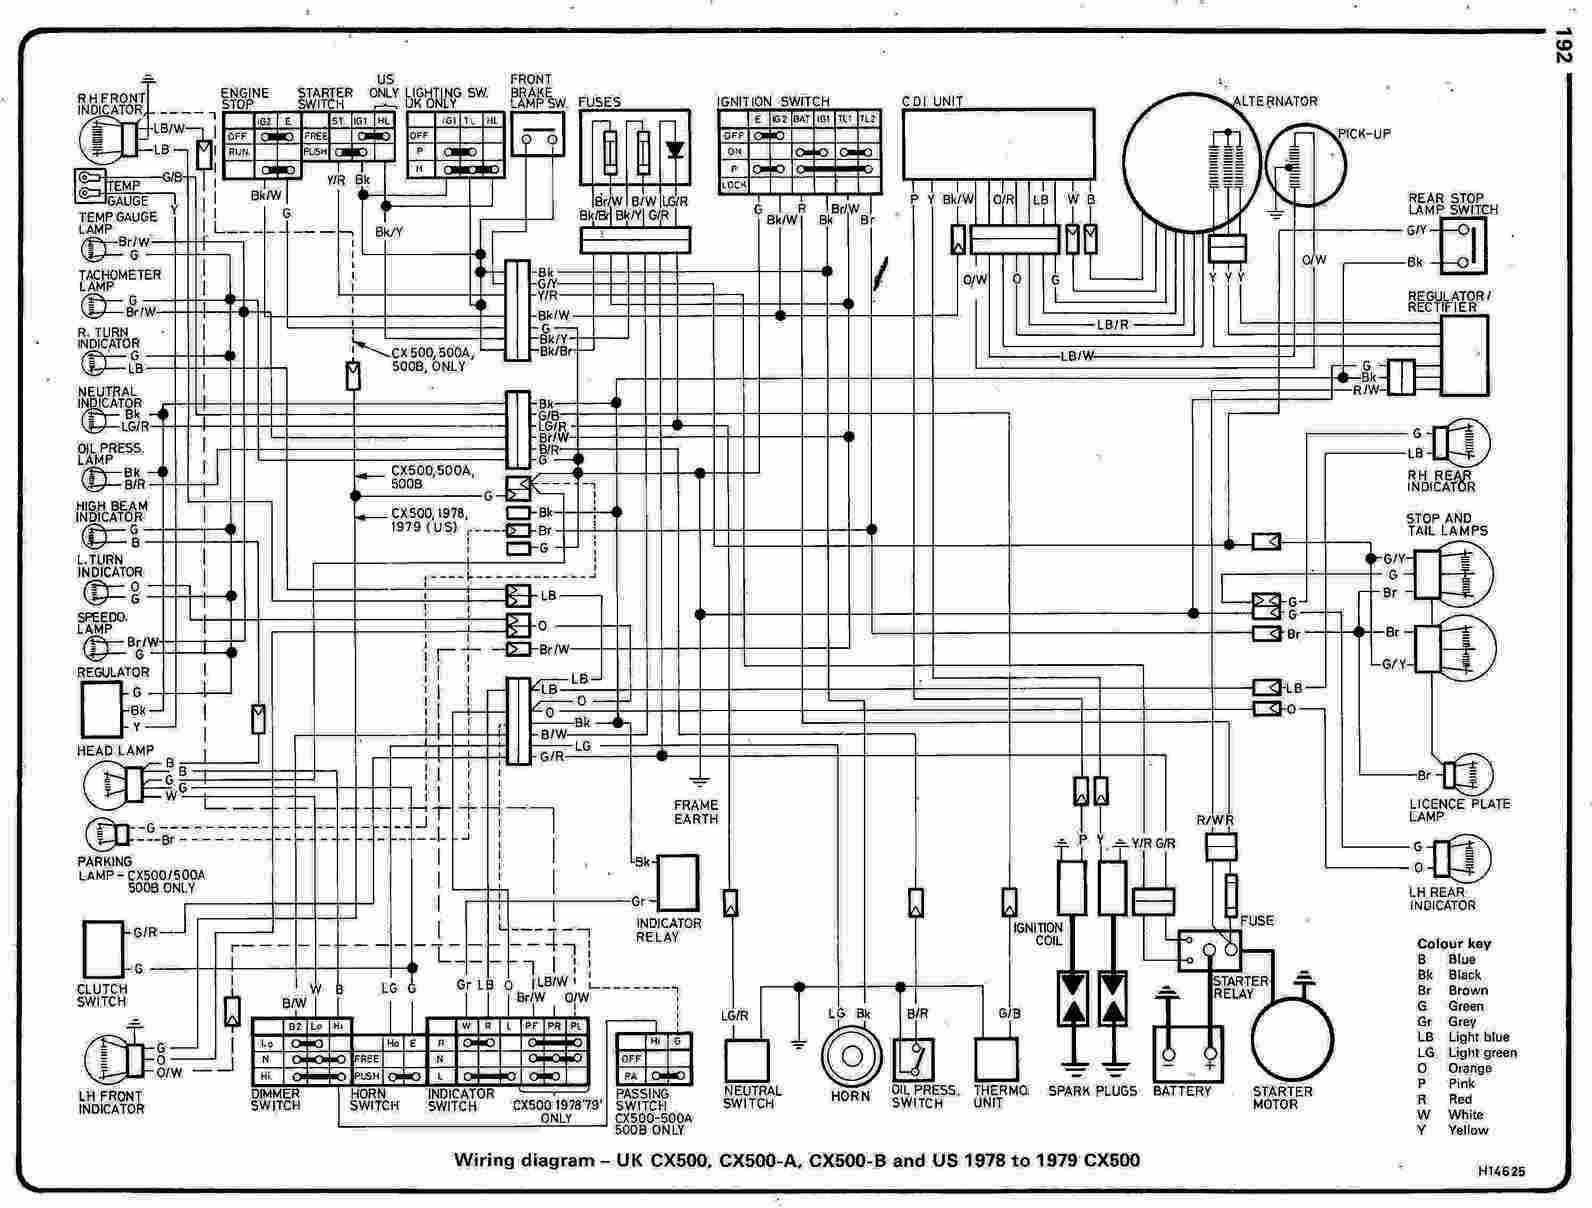 small resolution of 81 honda wiring diagram wiring diagram blog 81 honda gl500 wiring diagram 81 honda wiring diagram